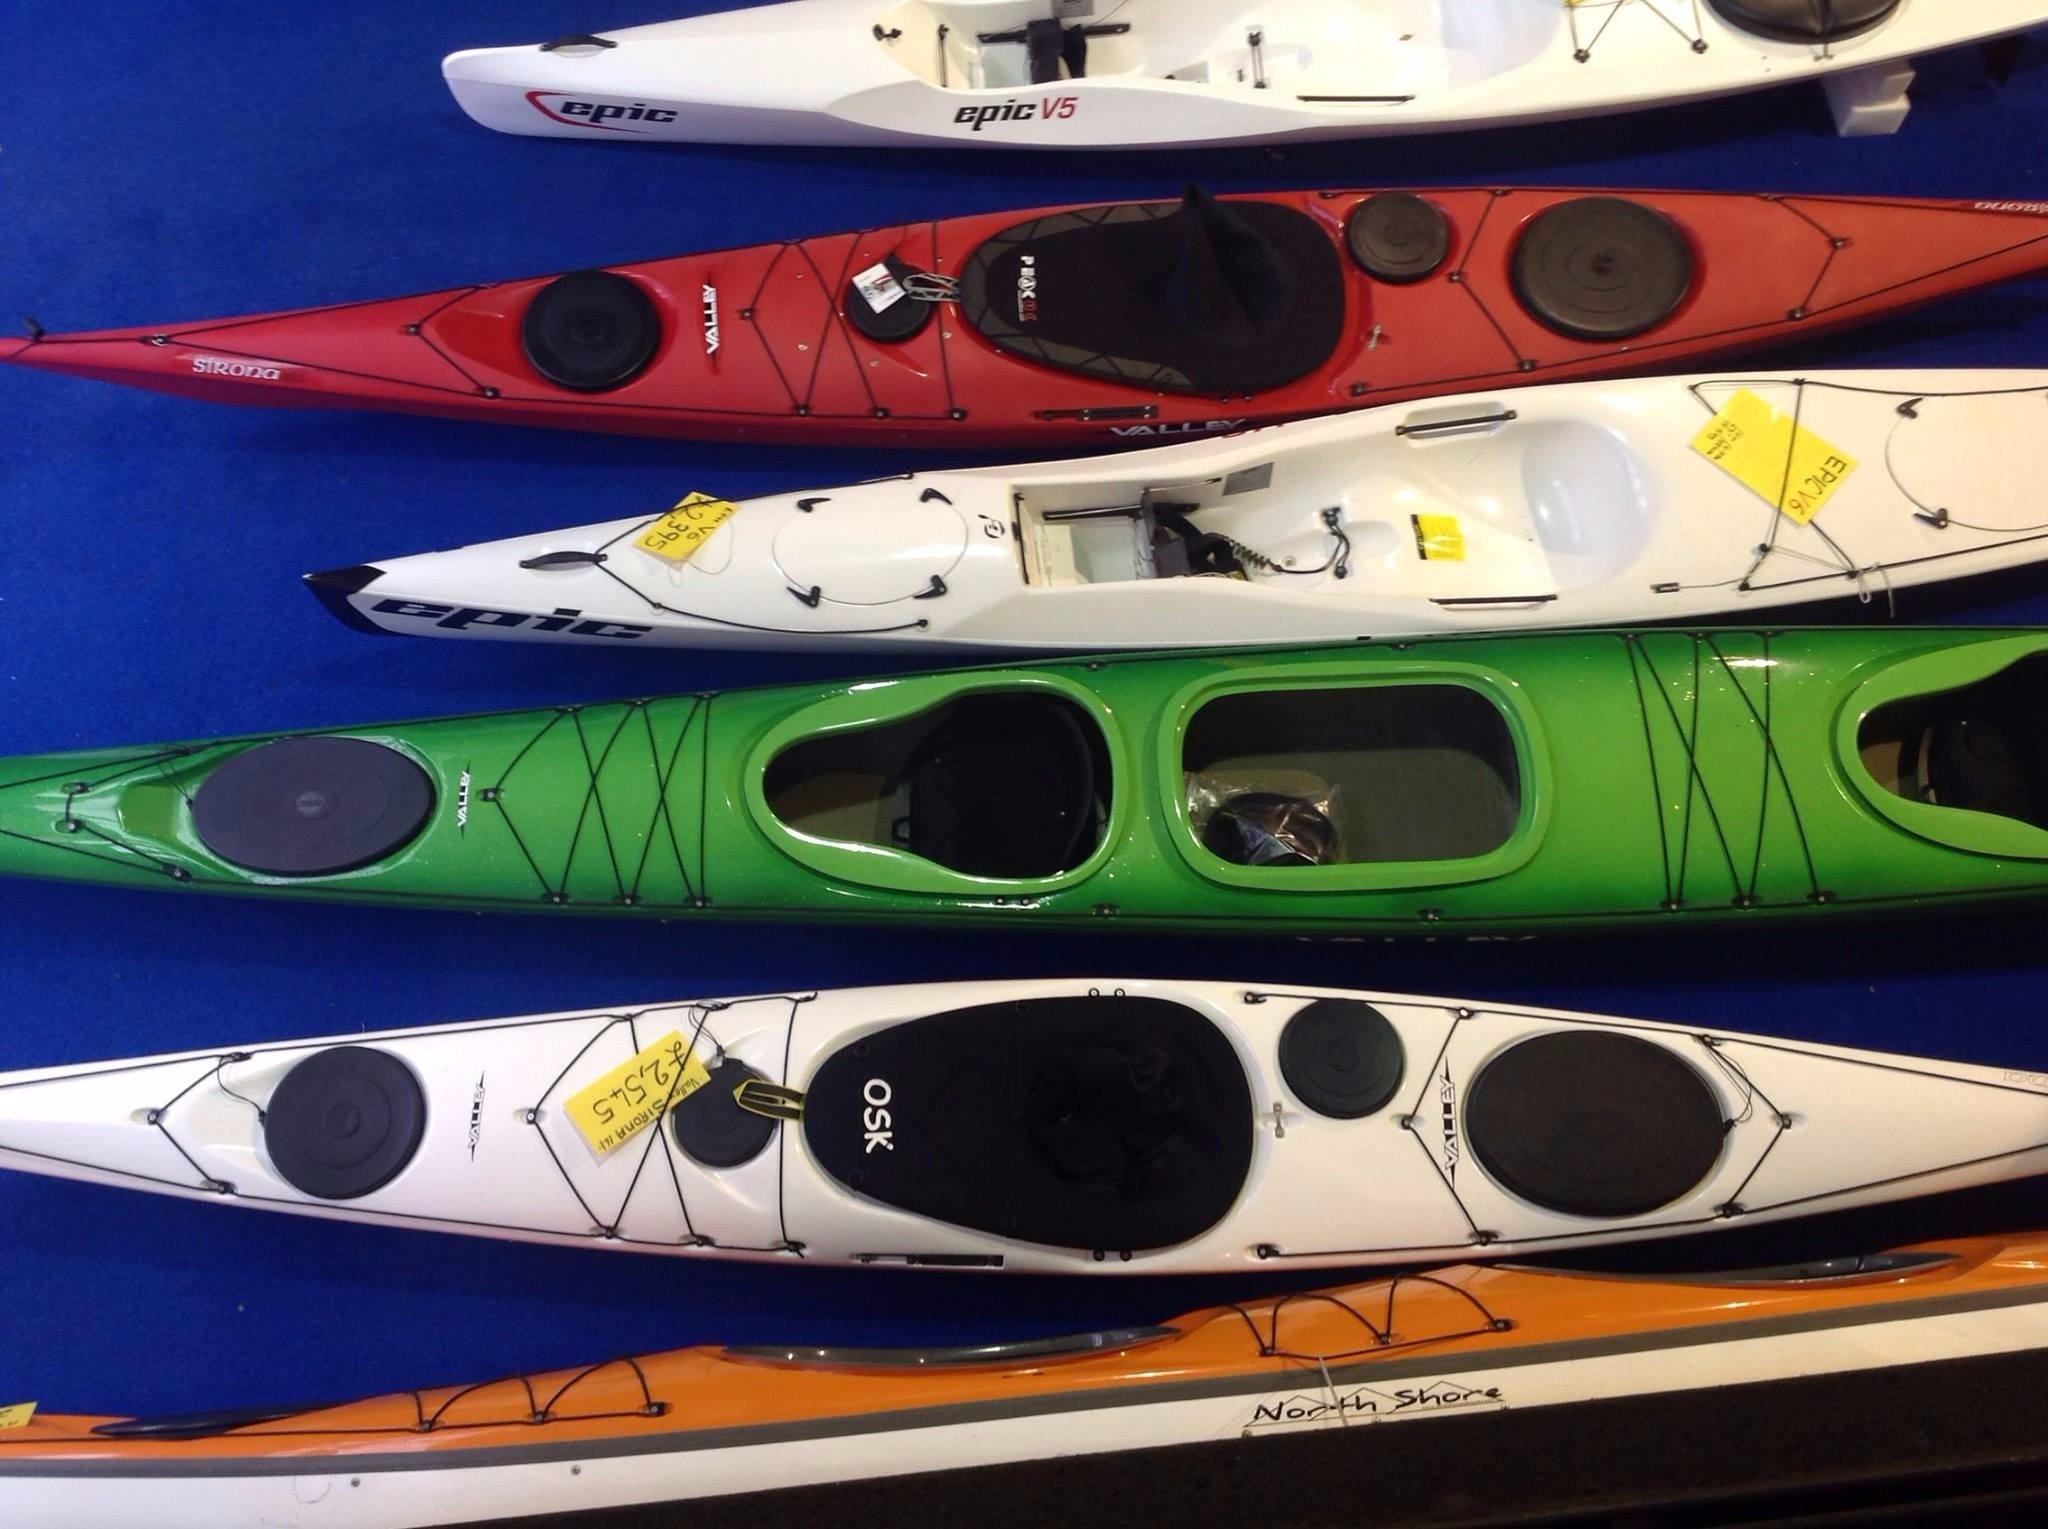 Fiberglass and Plastic Boats Kayaks